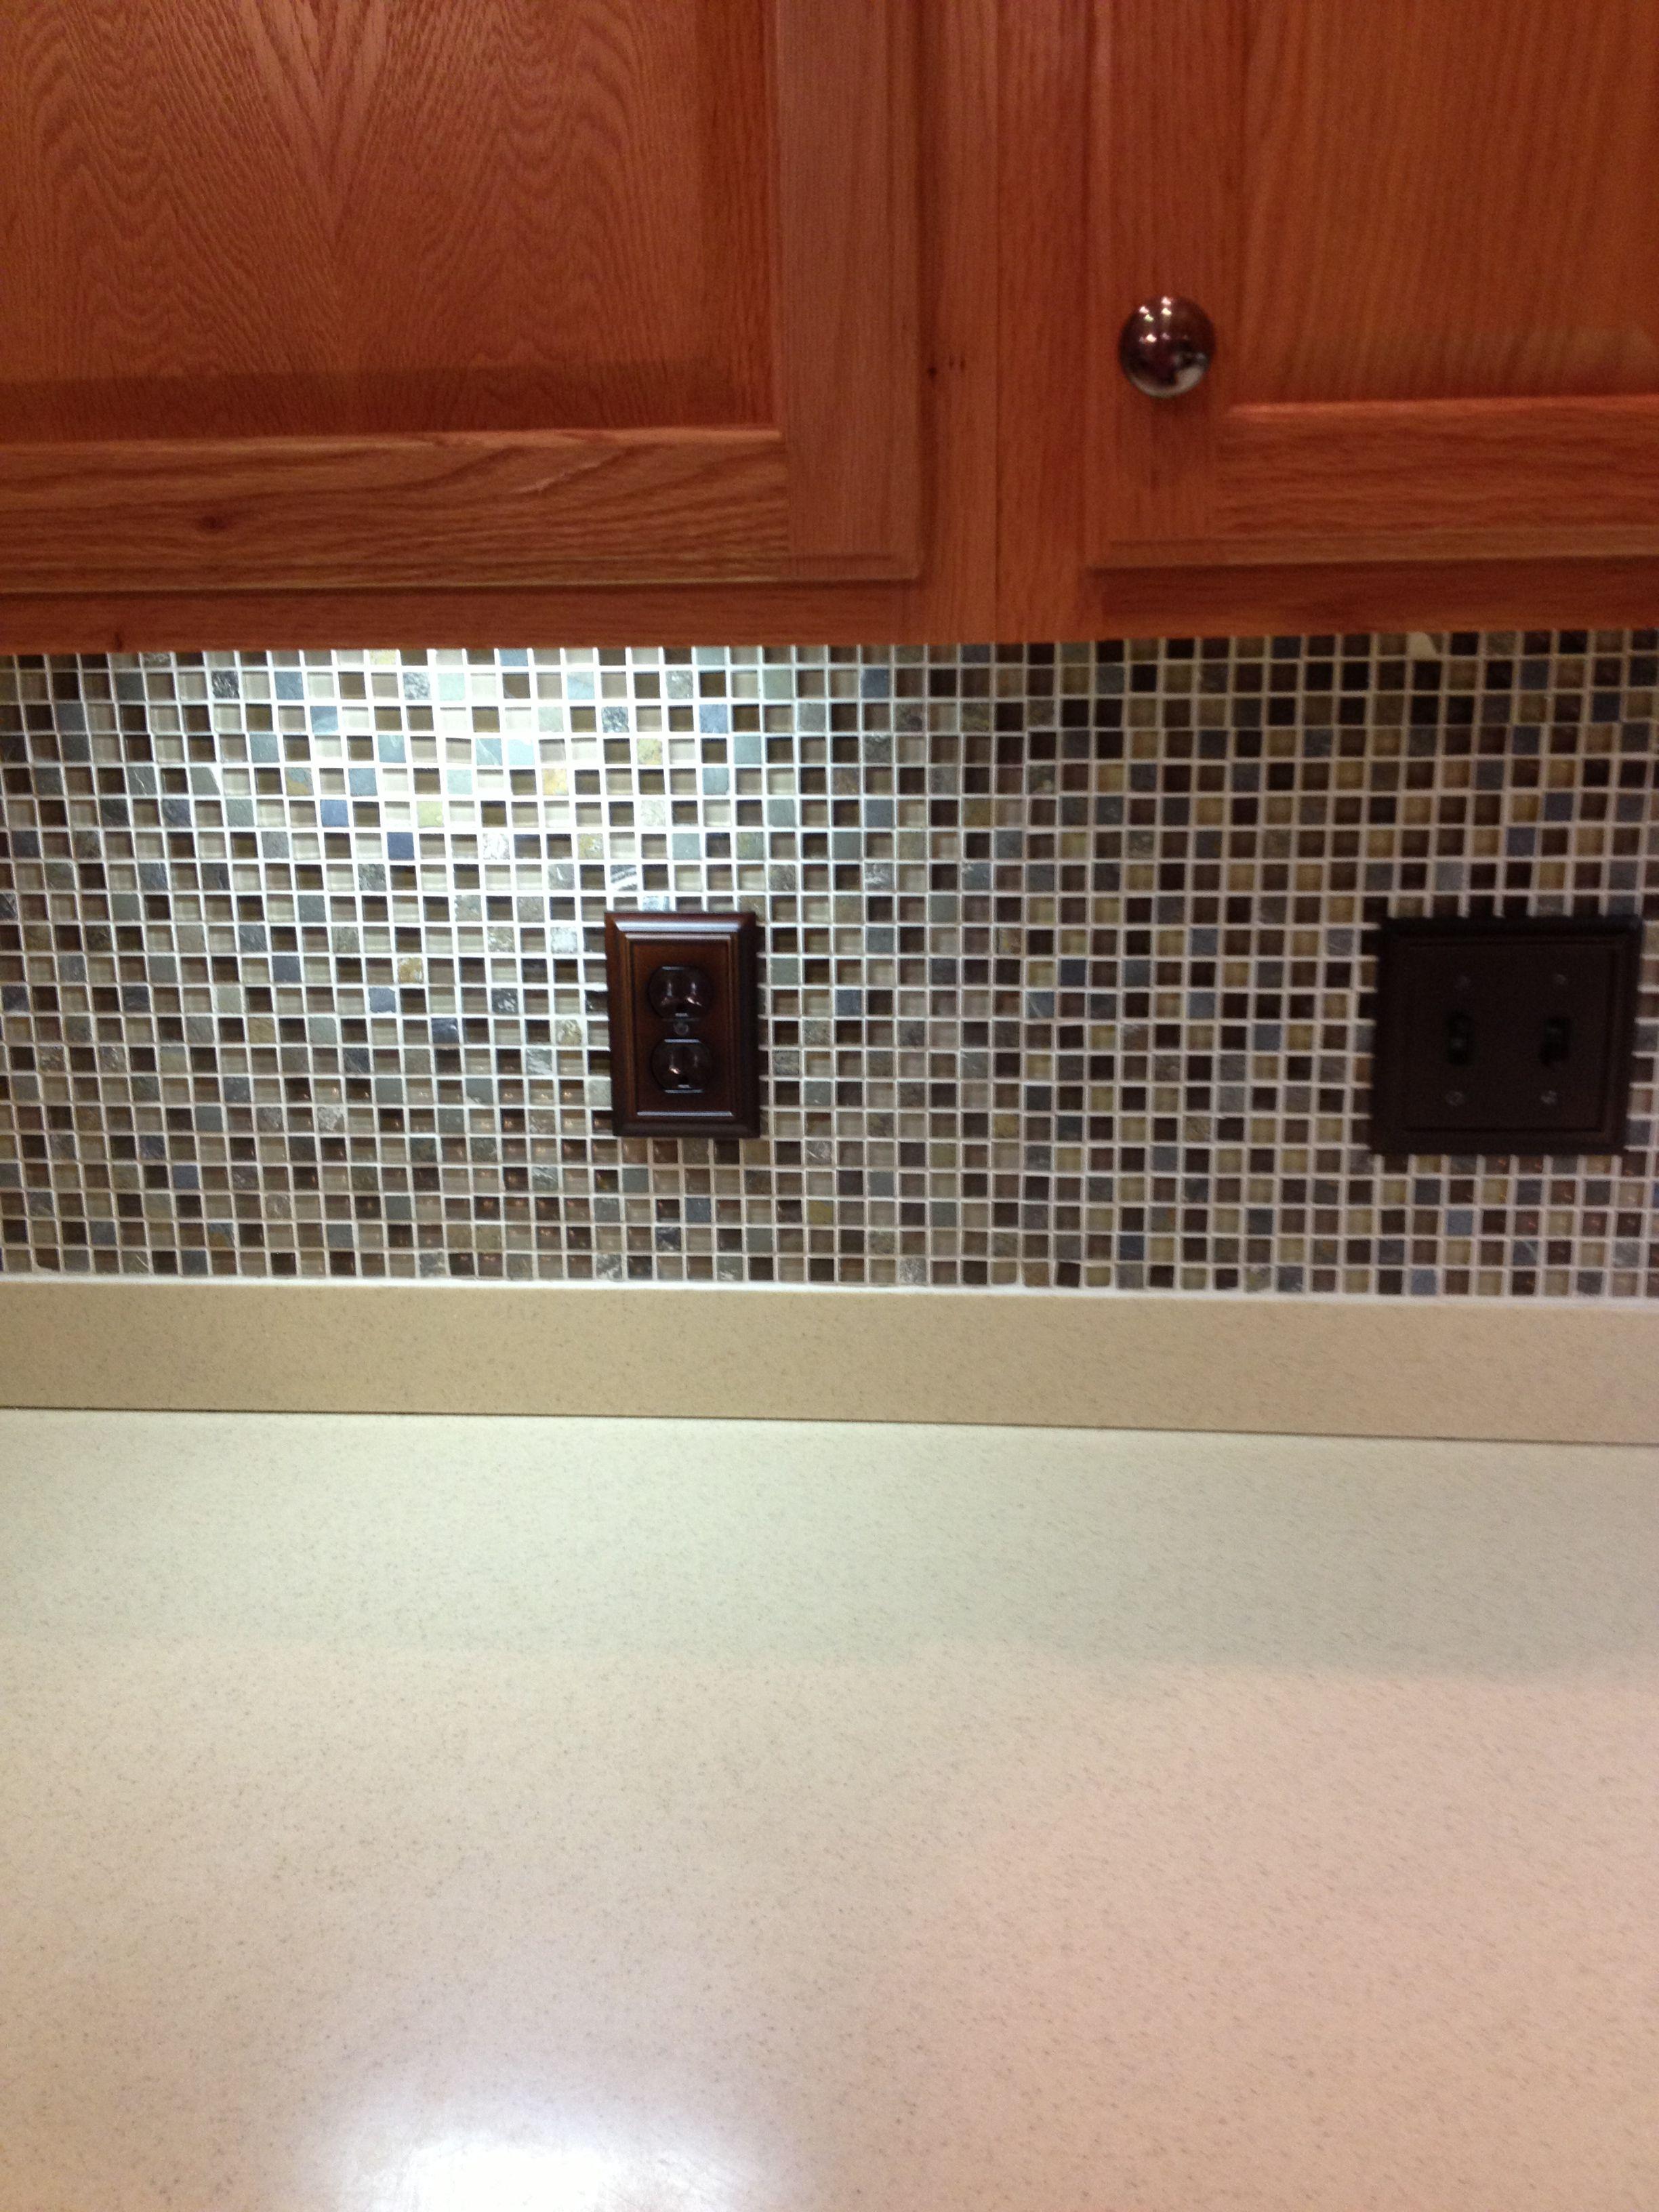 mosaic tile backsplash oak cabinets corian countertops mosaic tile backsplash oak cabinets corian countertops